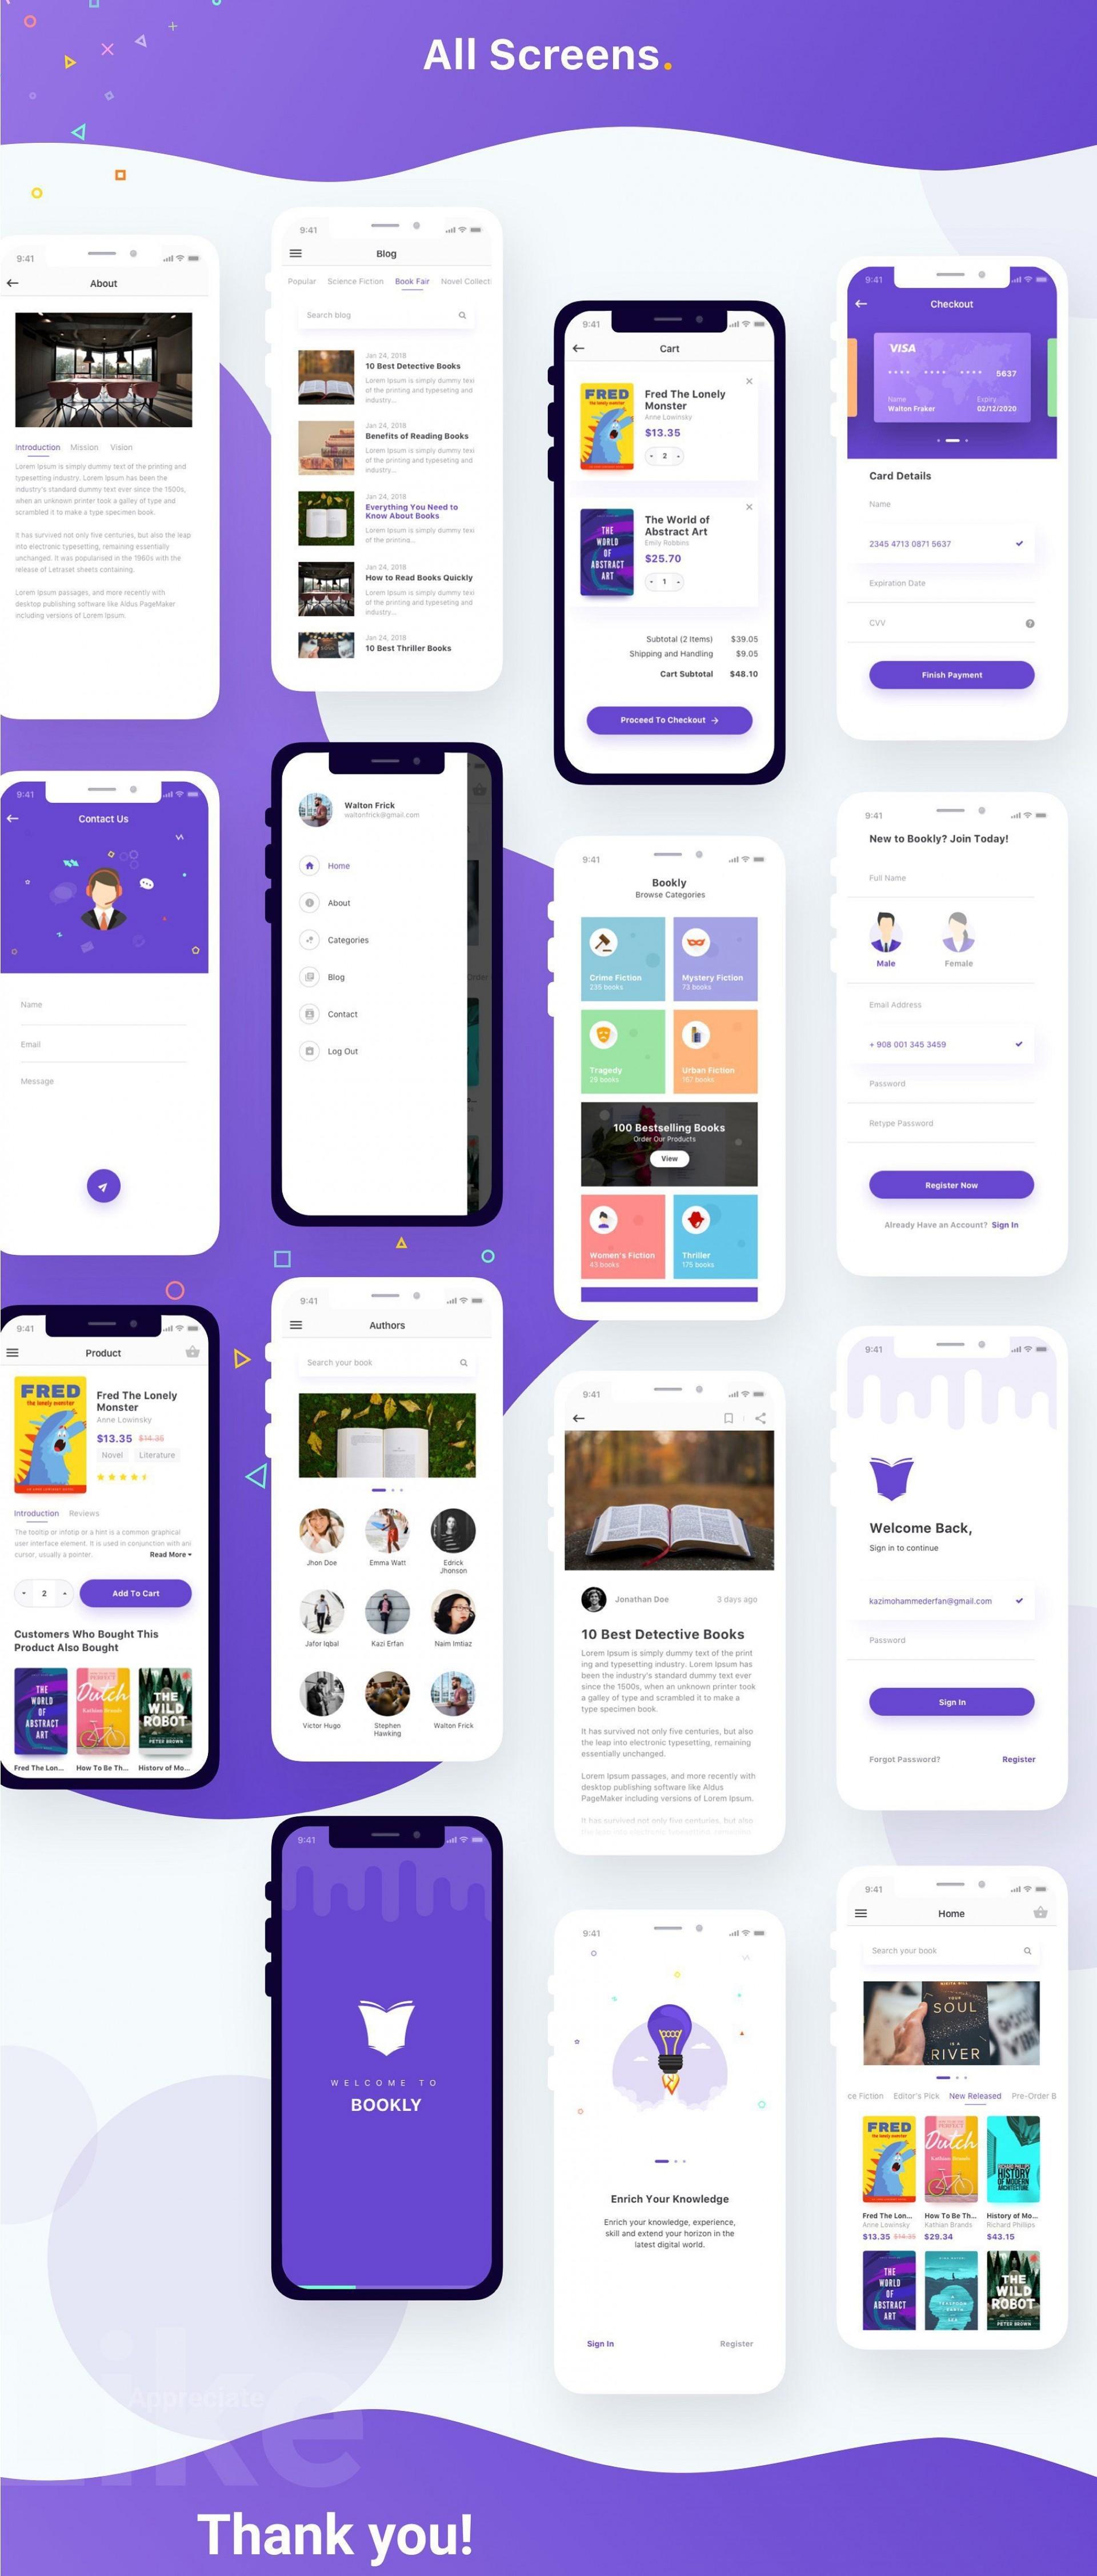 001 Fantastic Iphone App Design Template High Def  X Io Sketch1920